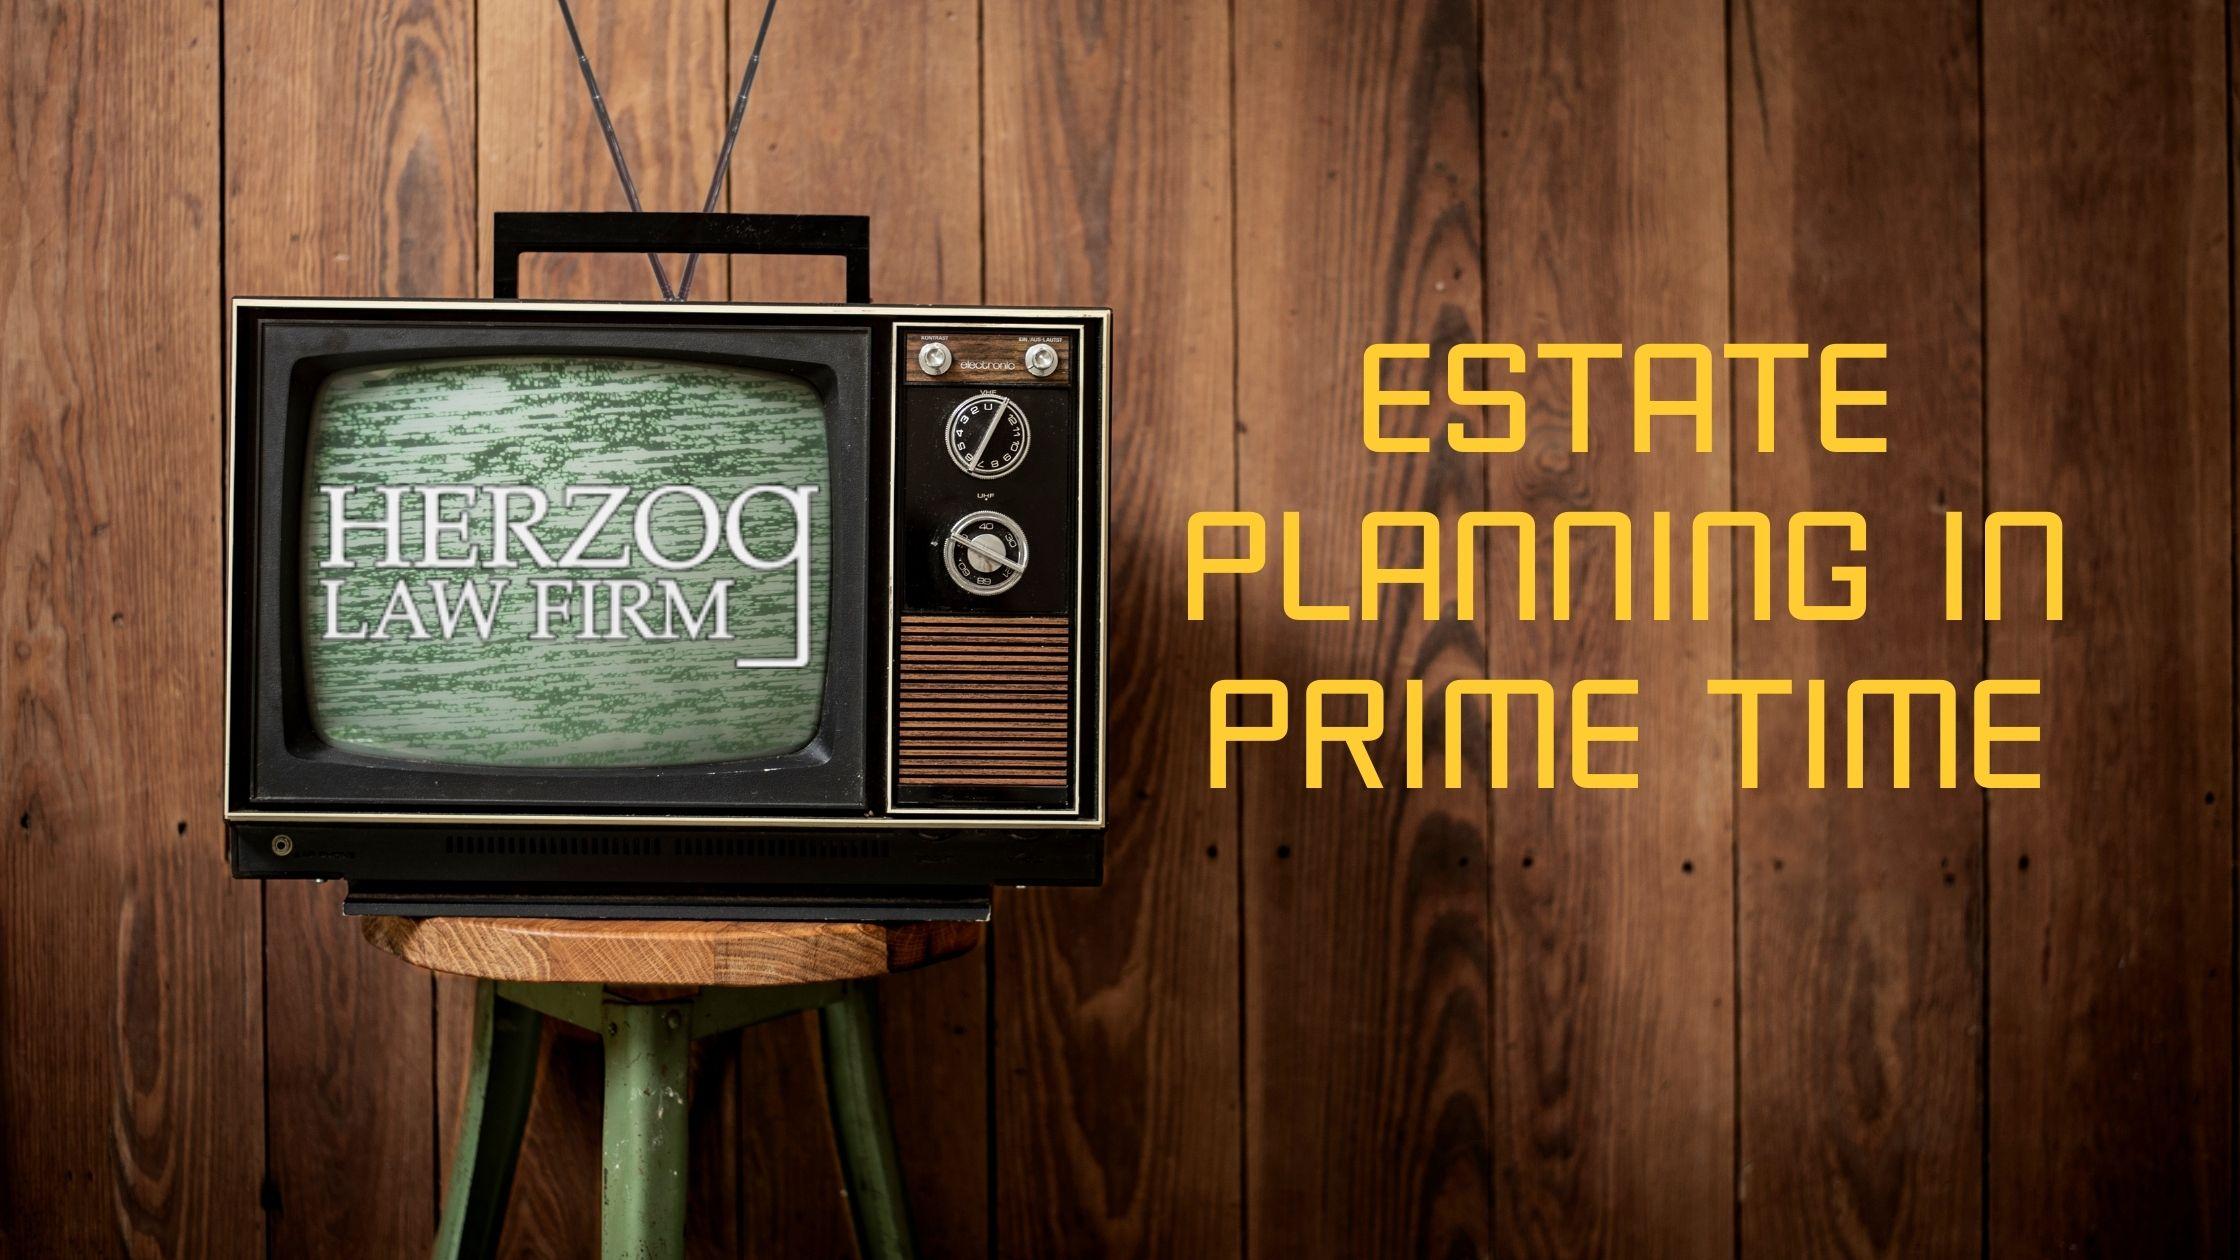 estate planning in prime time